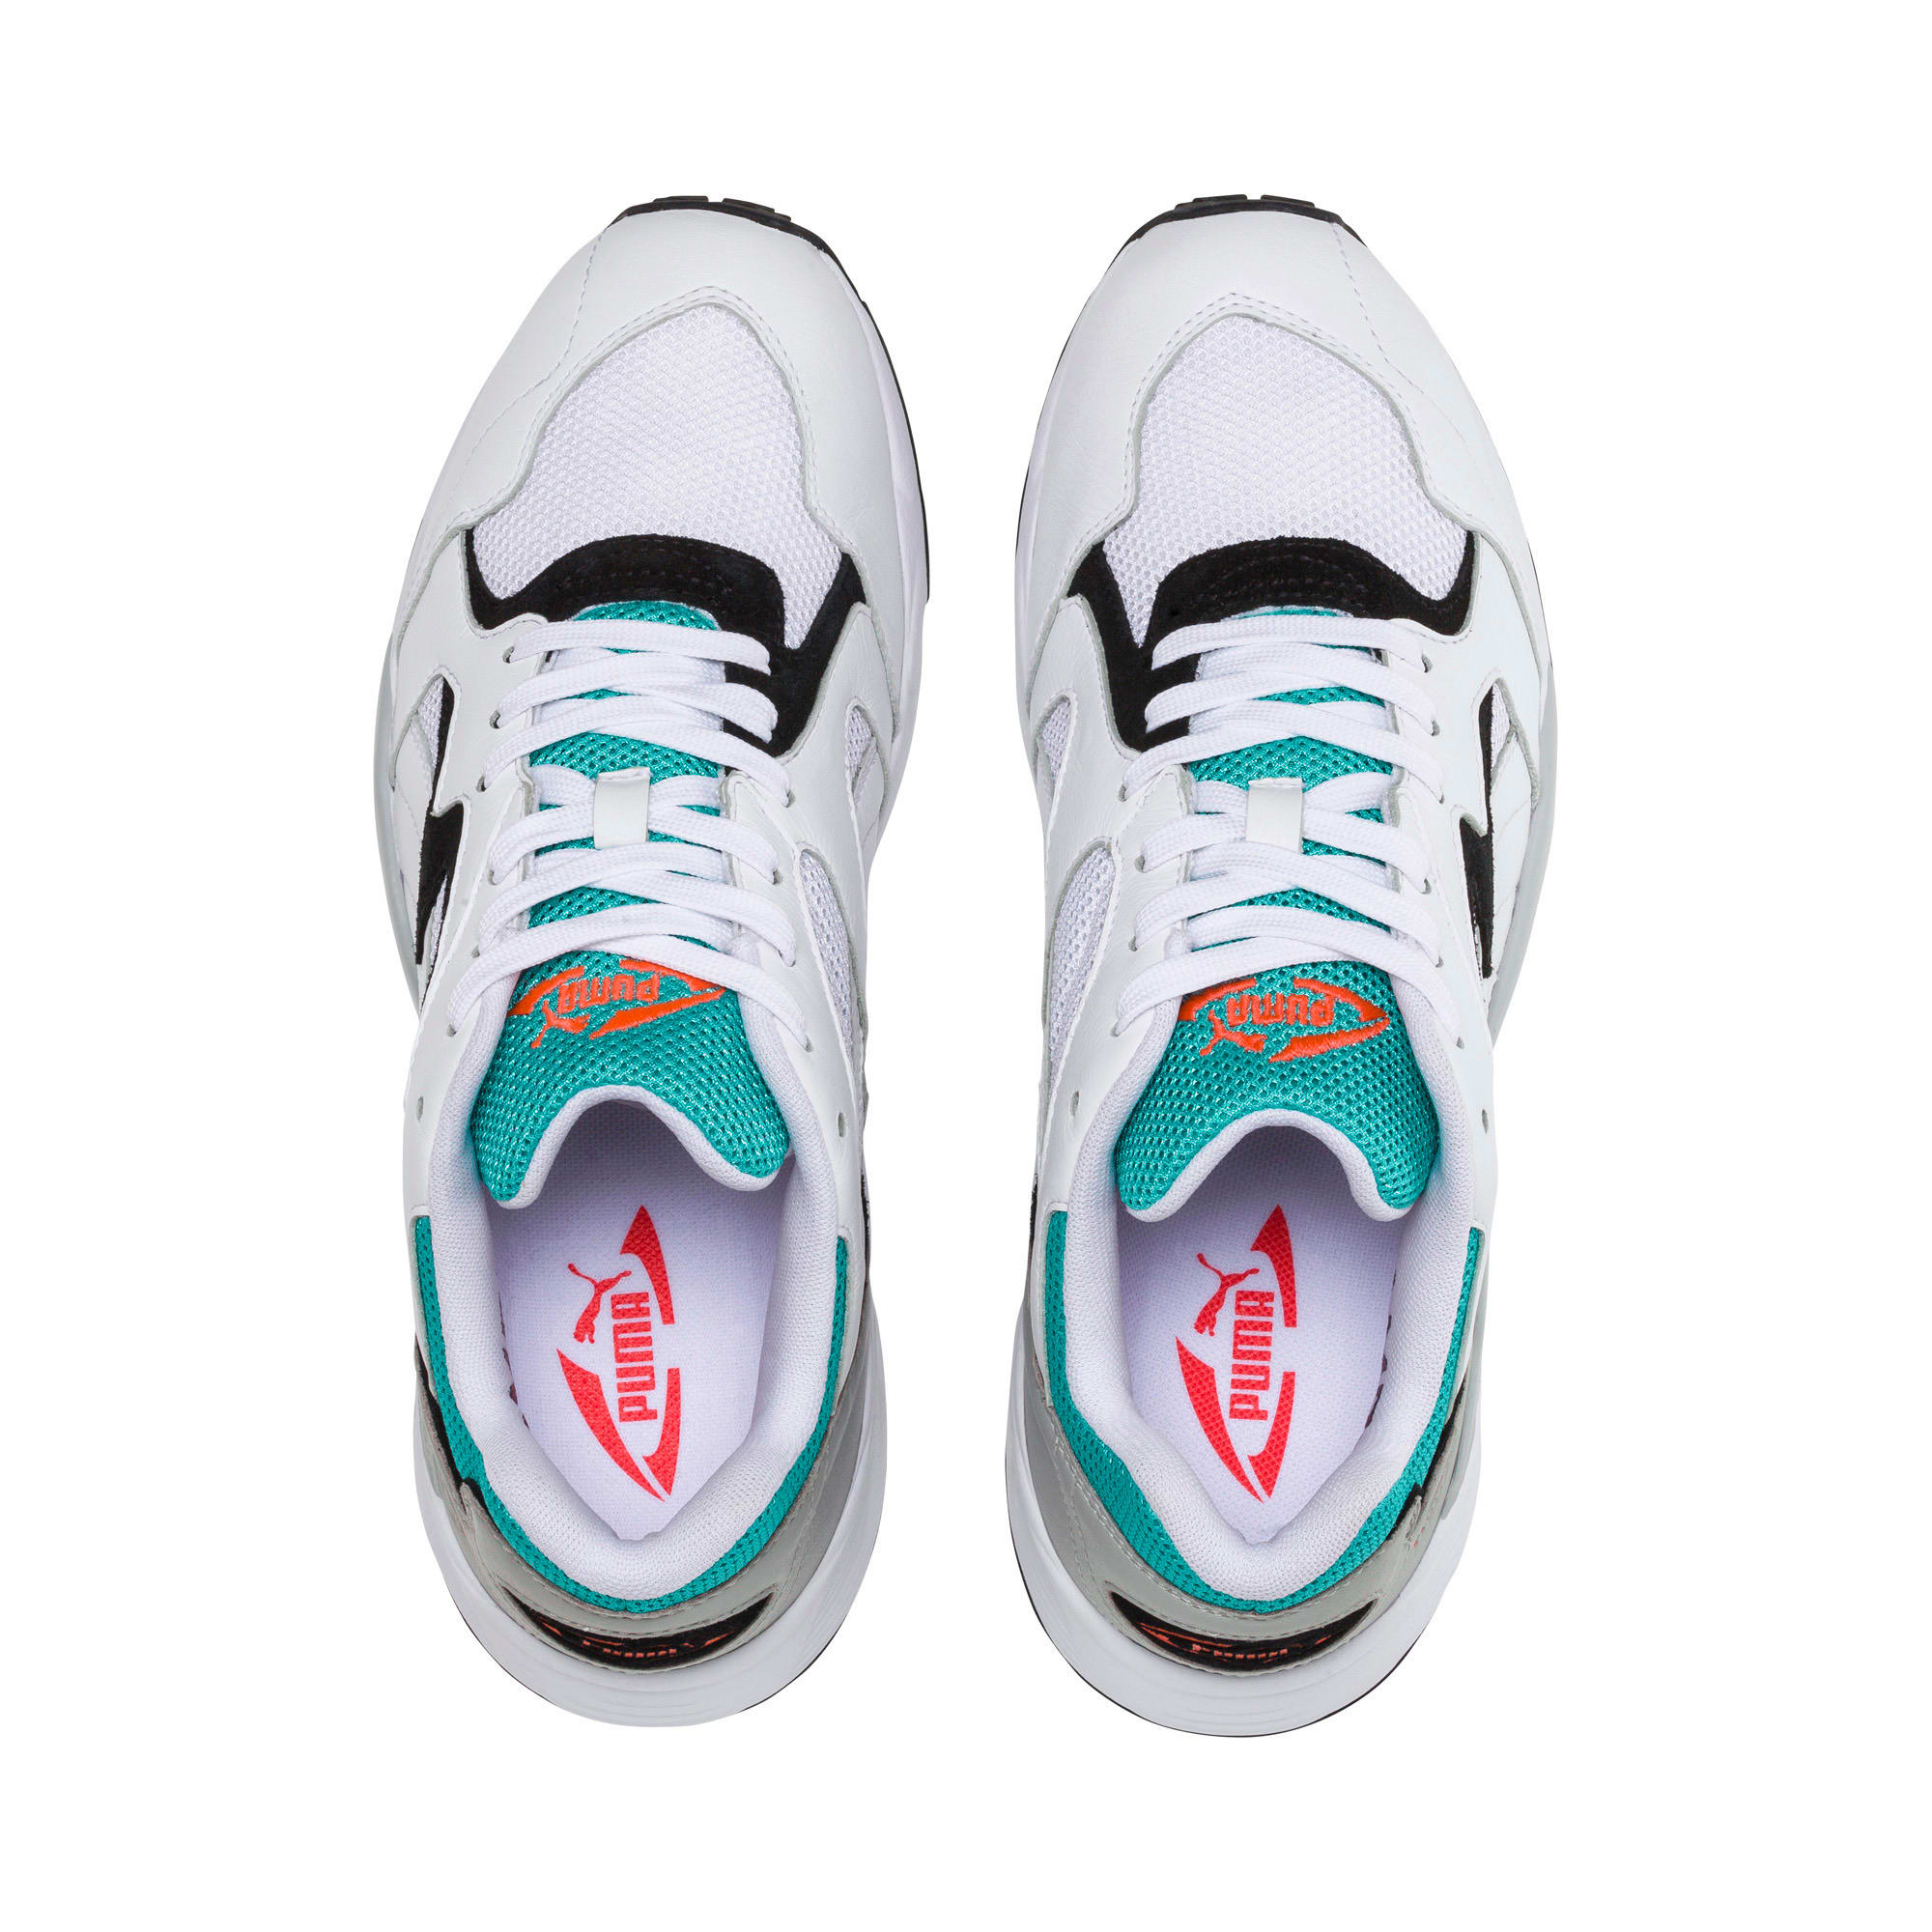 Thumbnail 6 of Prevail Classic Sneakers, Puma White-Blue Turquoise, medium